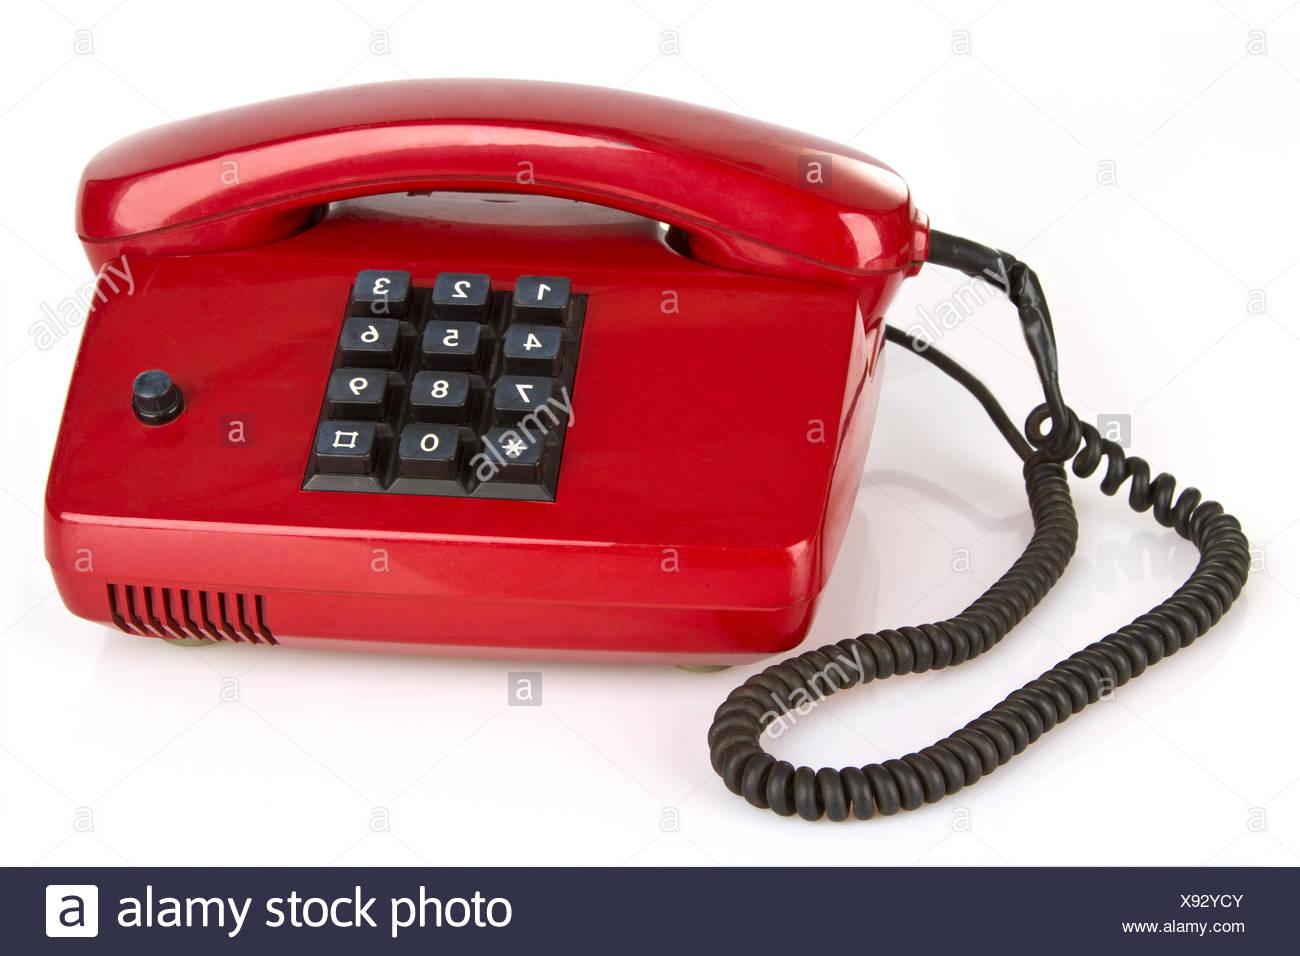 Retro Telefon auf hellem Hintergrund - Stock Image